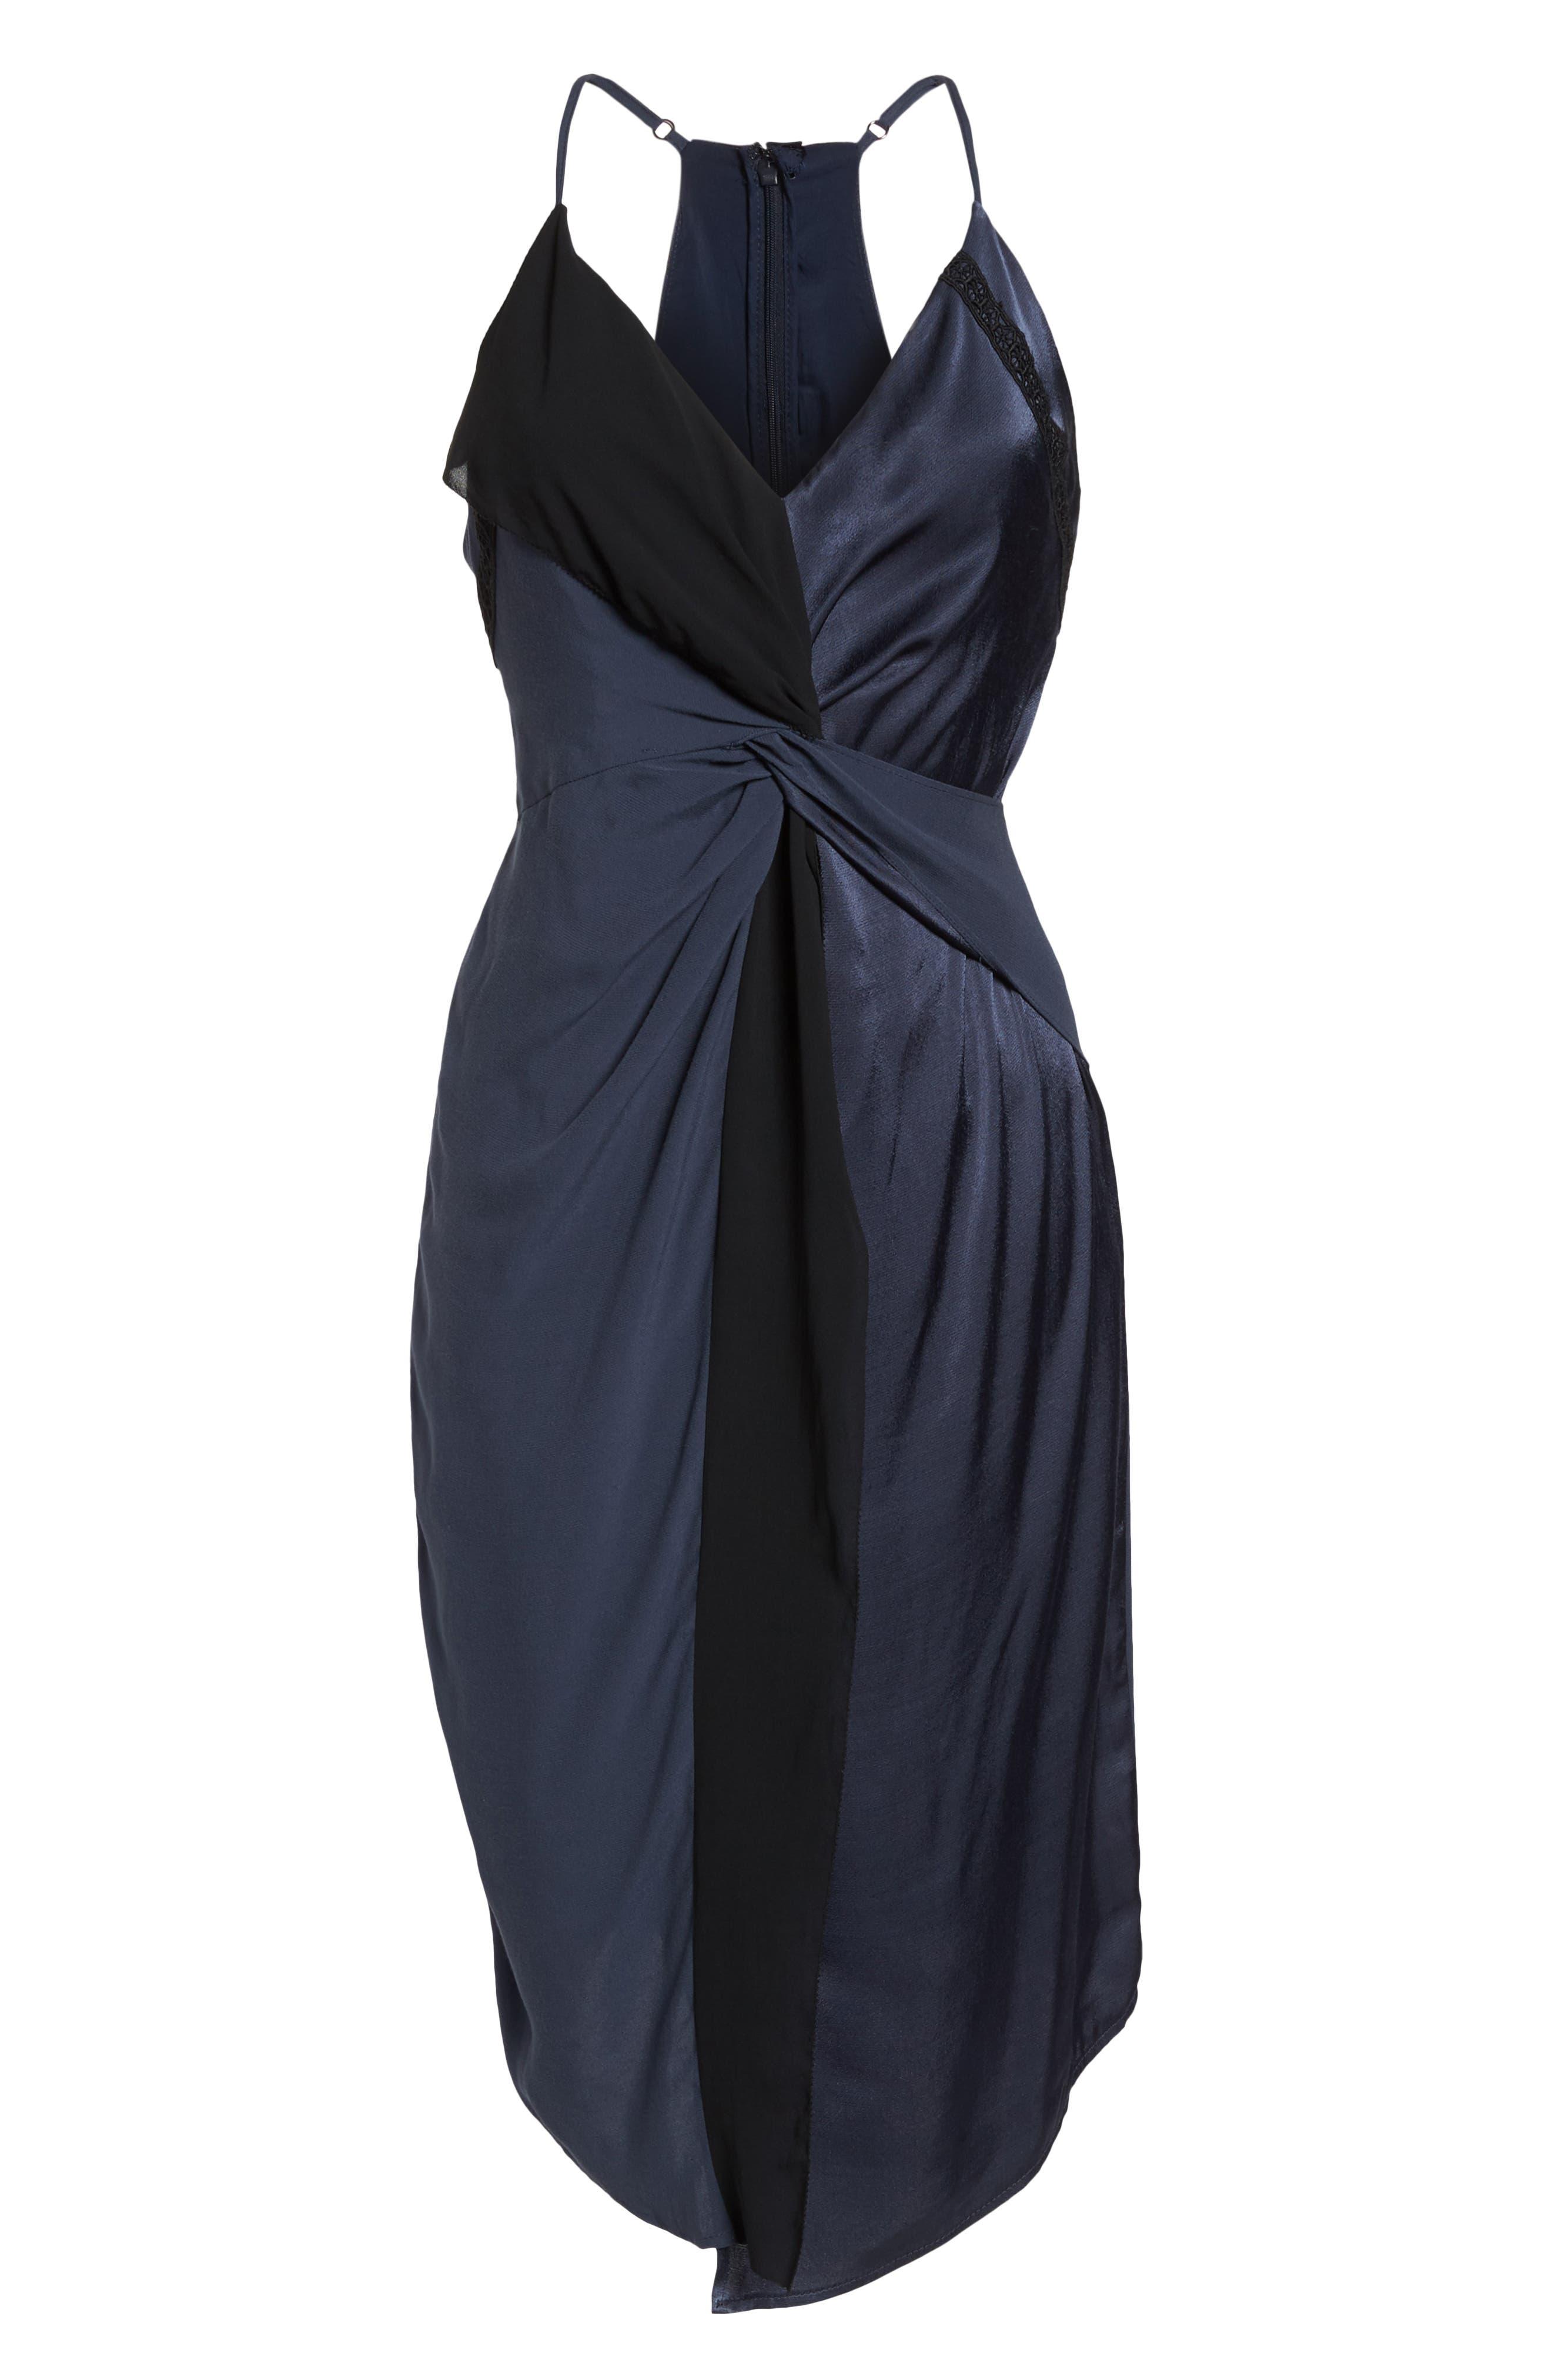 Twist Front Cocktail Dress,                             Alternate thumbnail 7, color,                             BLACK/ NAVY